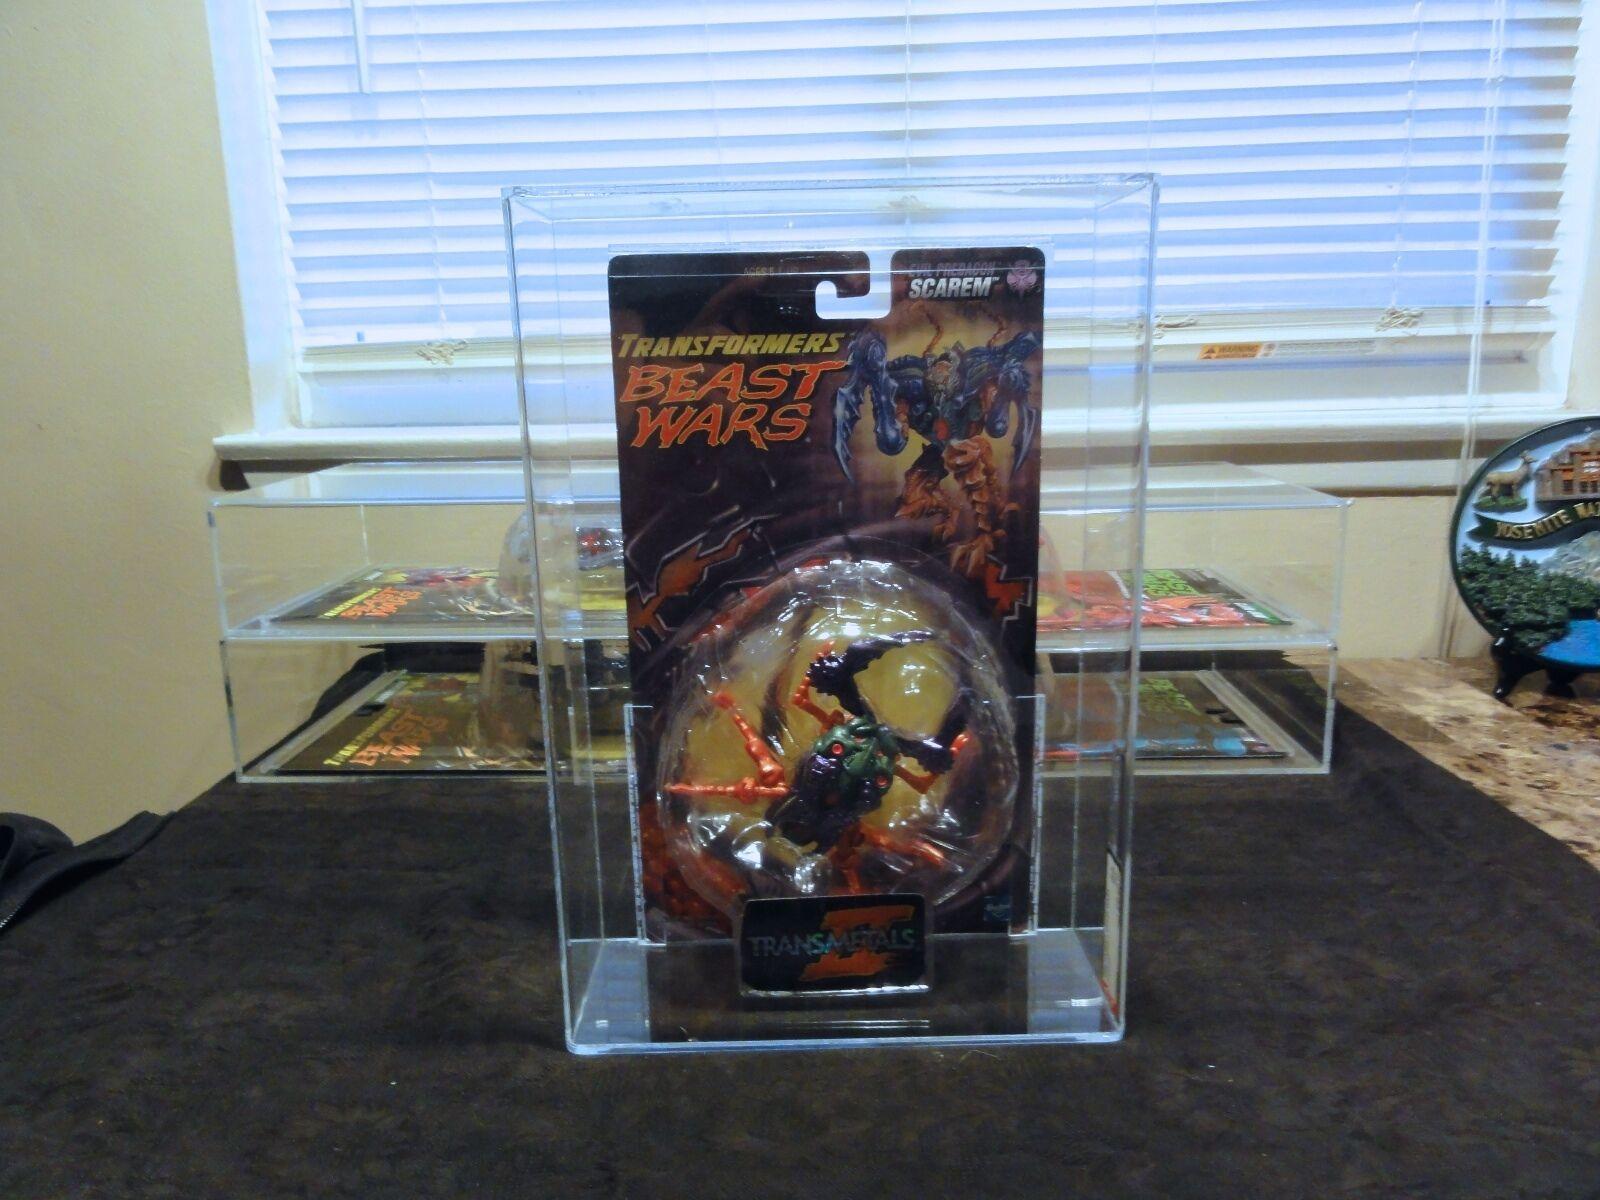 Transformers AFA Beast Wars 1998 Transmetal Scarem Sealed MIB BOX